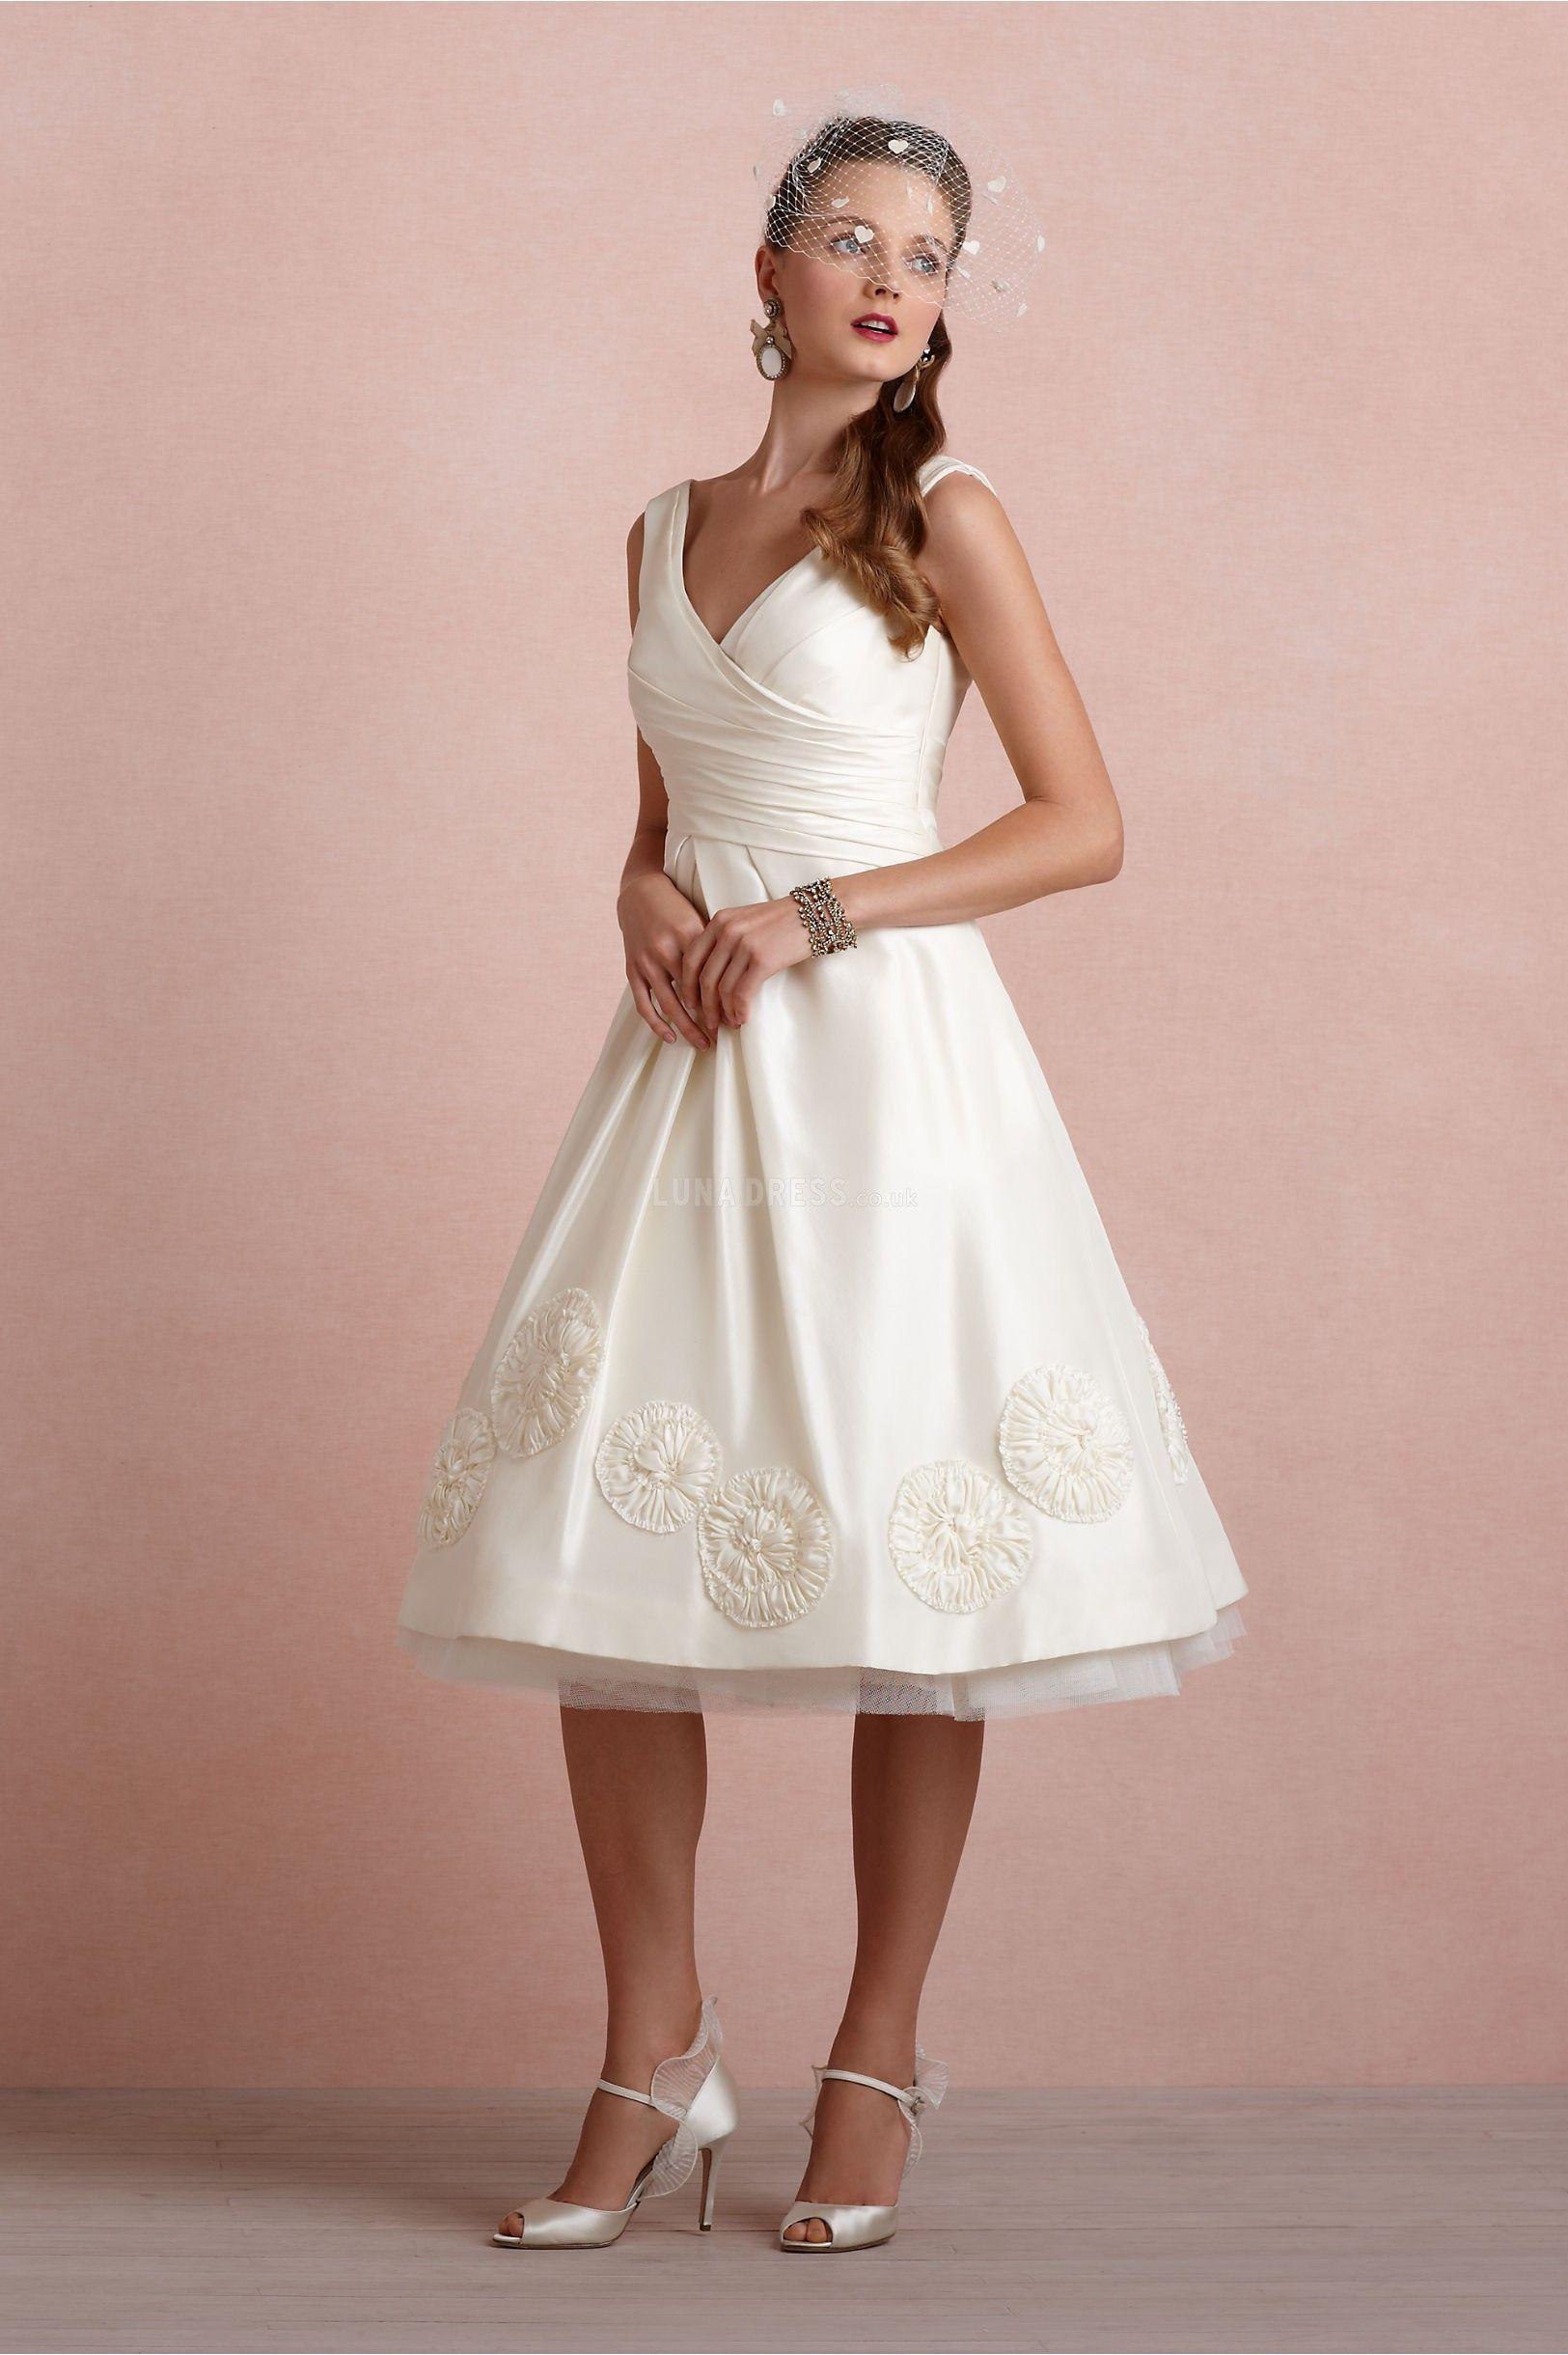 bridal dresses,wedding dresses UK,wedding gowns | My wish list ...